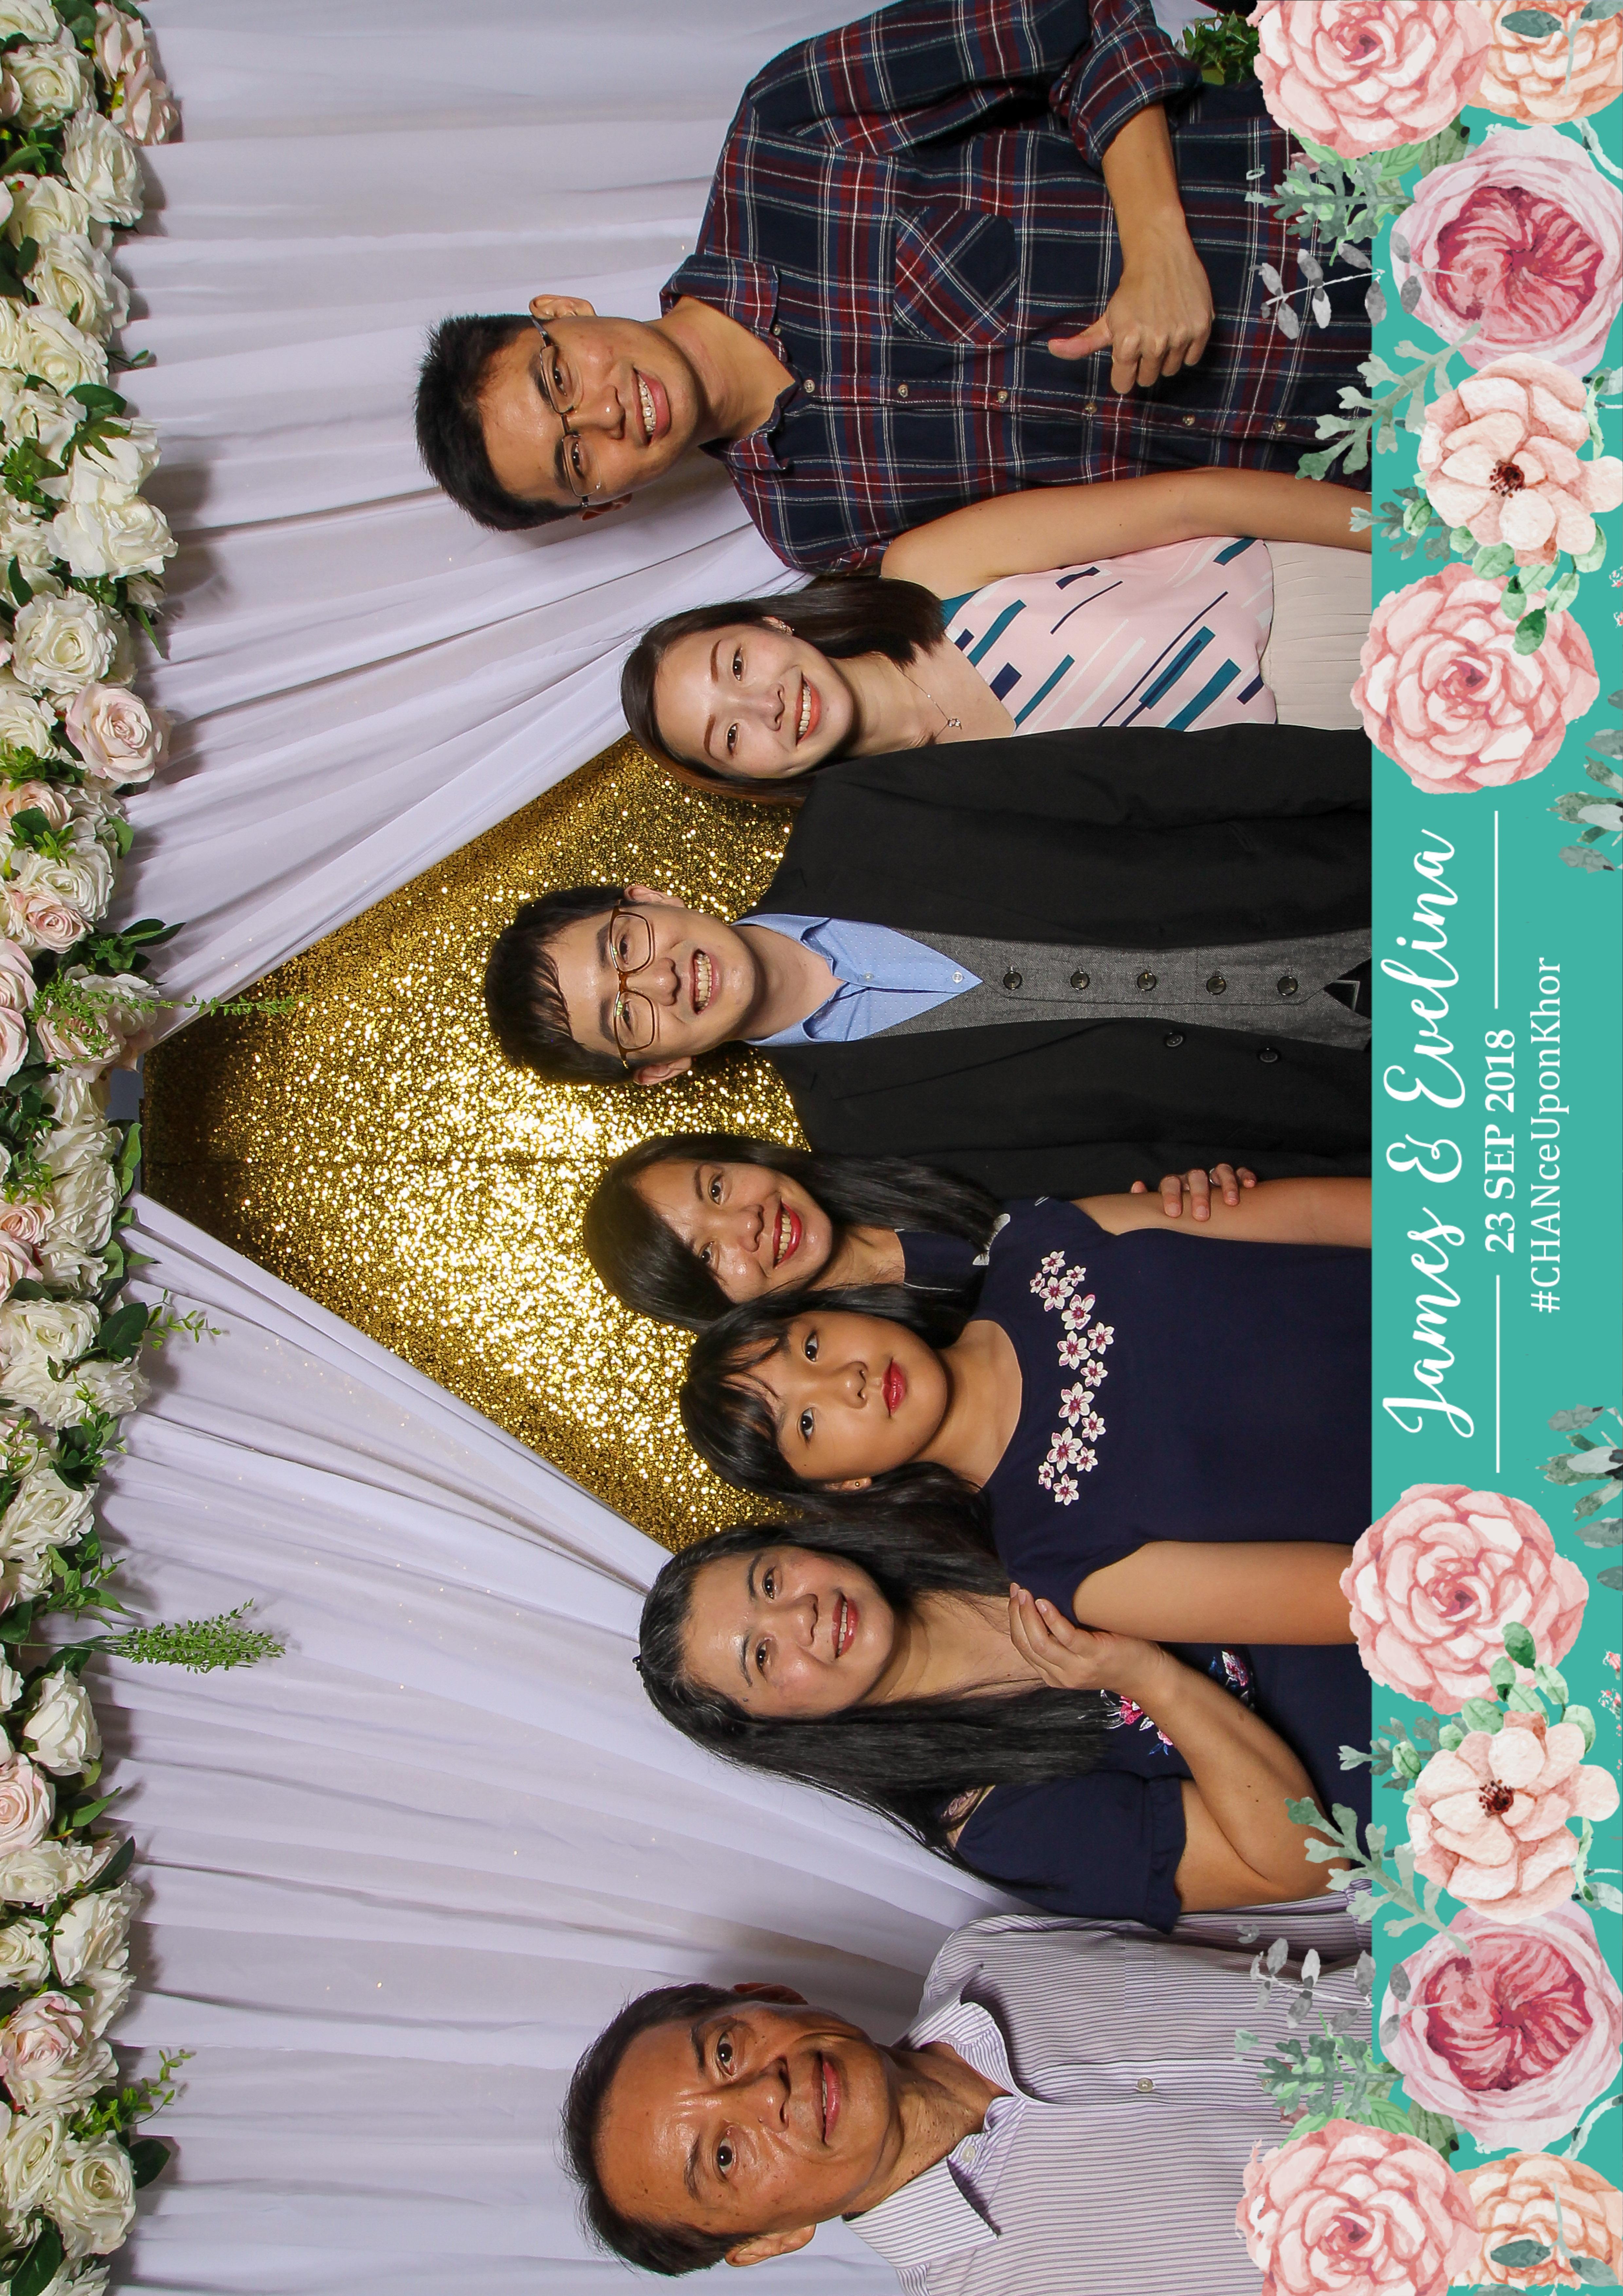 wedding photo booth singapore-19